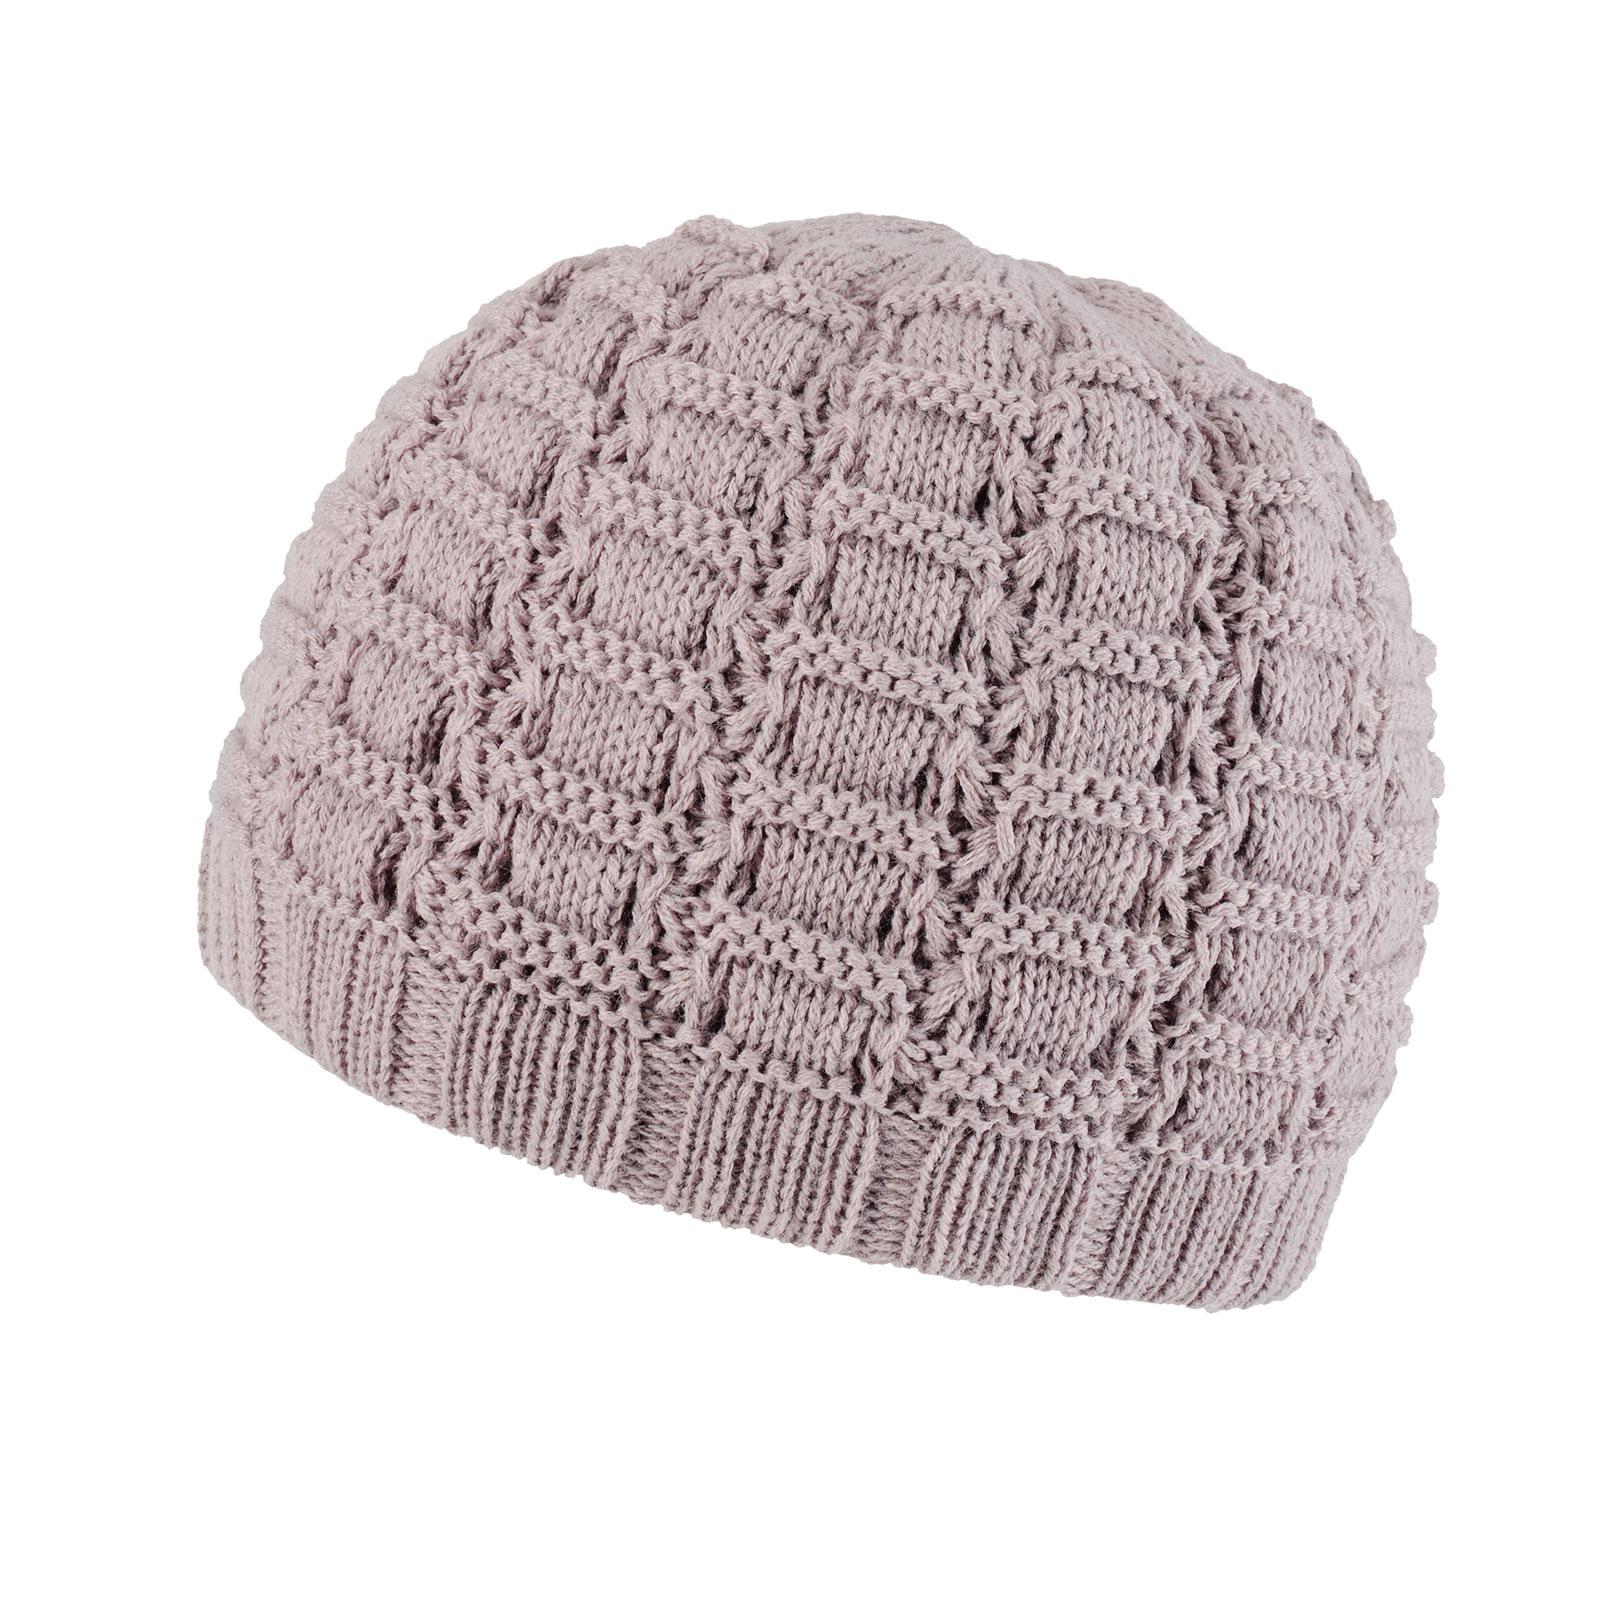 CP-00824-F16-bonnet-femme-maille-beige